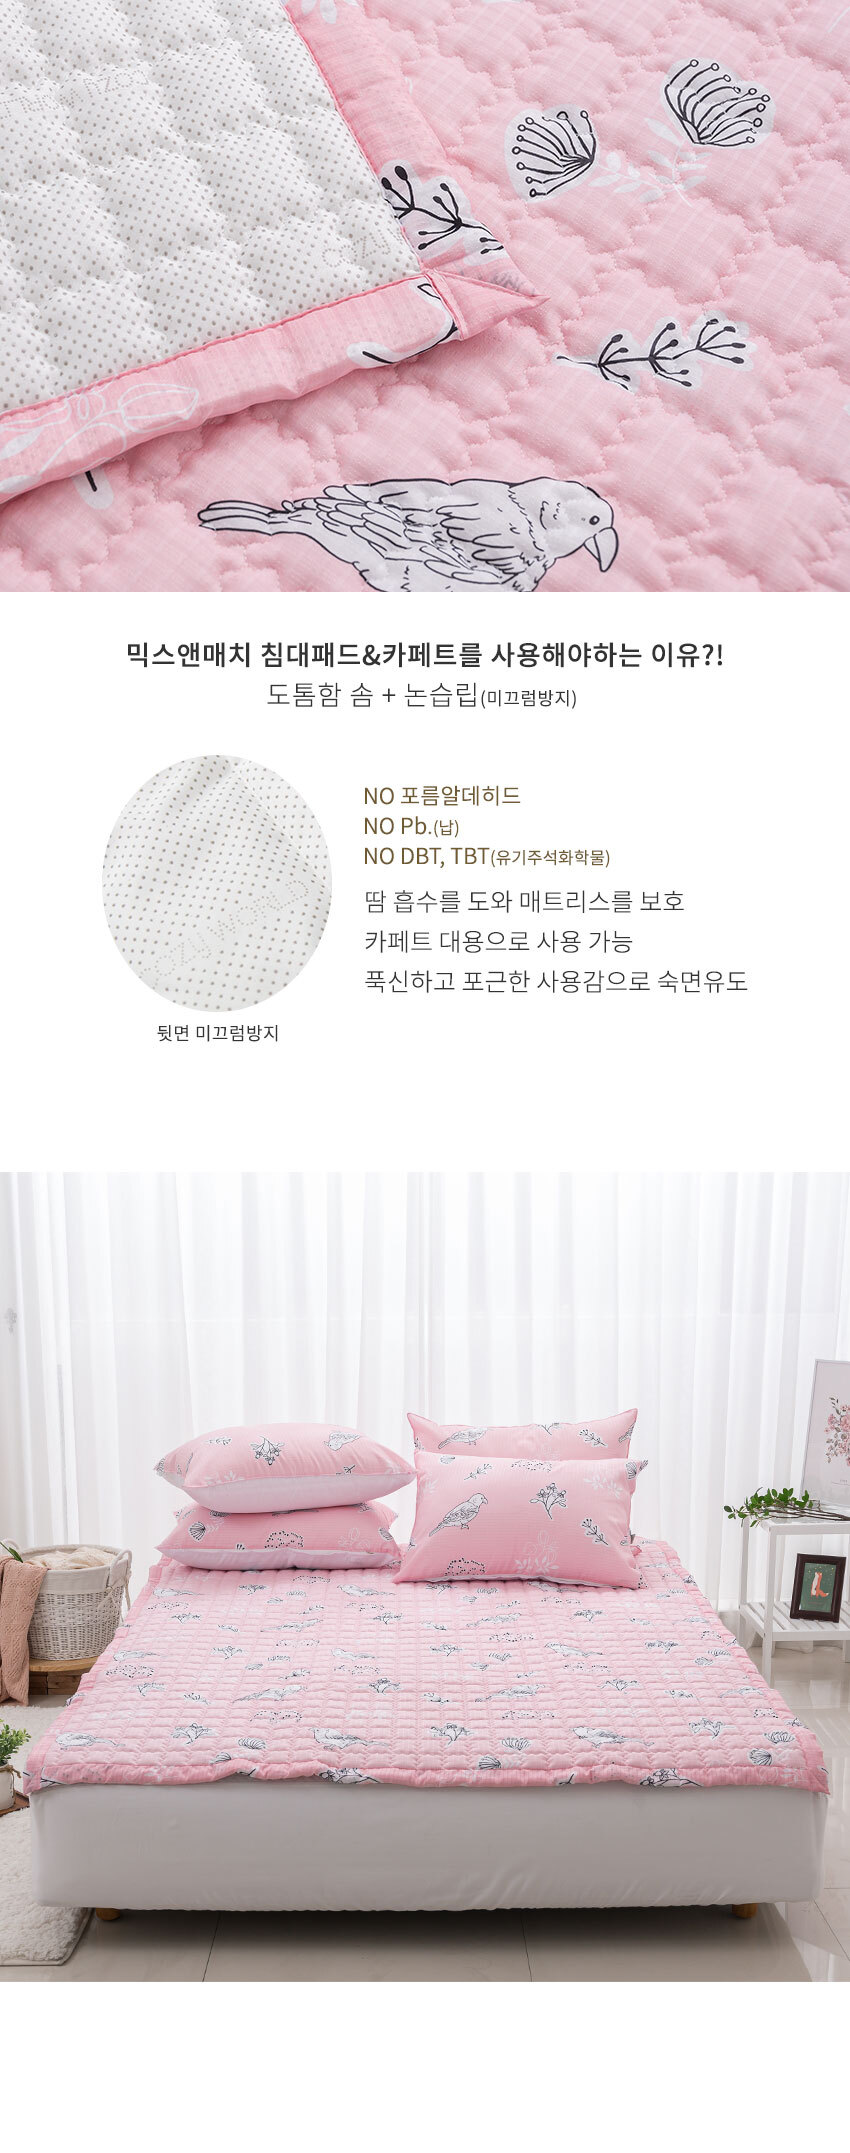 bird_carpet_pink.jpg